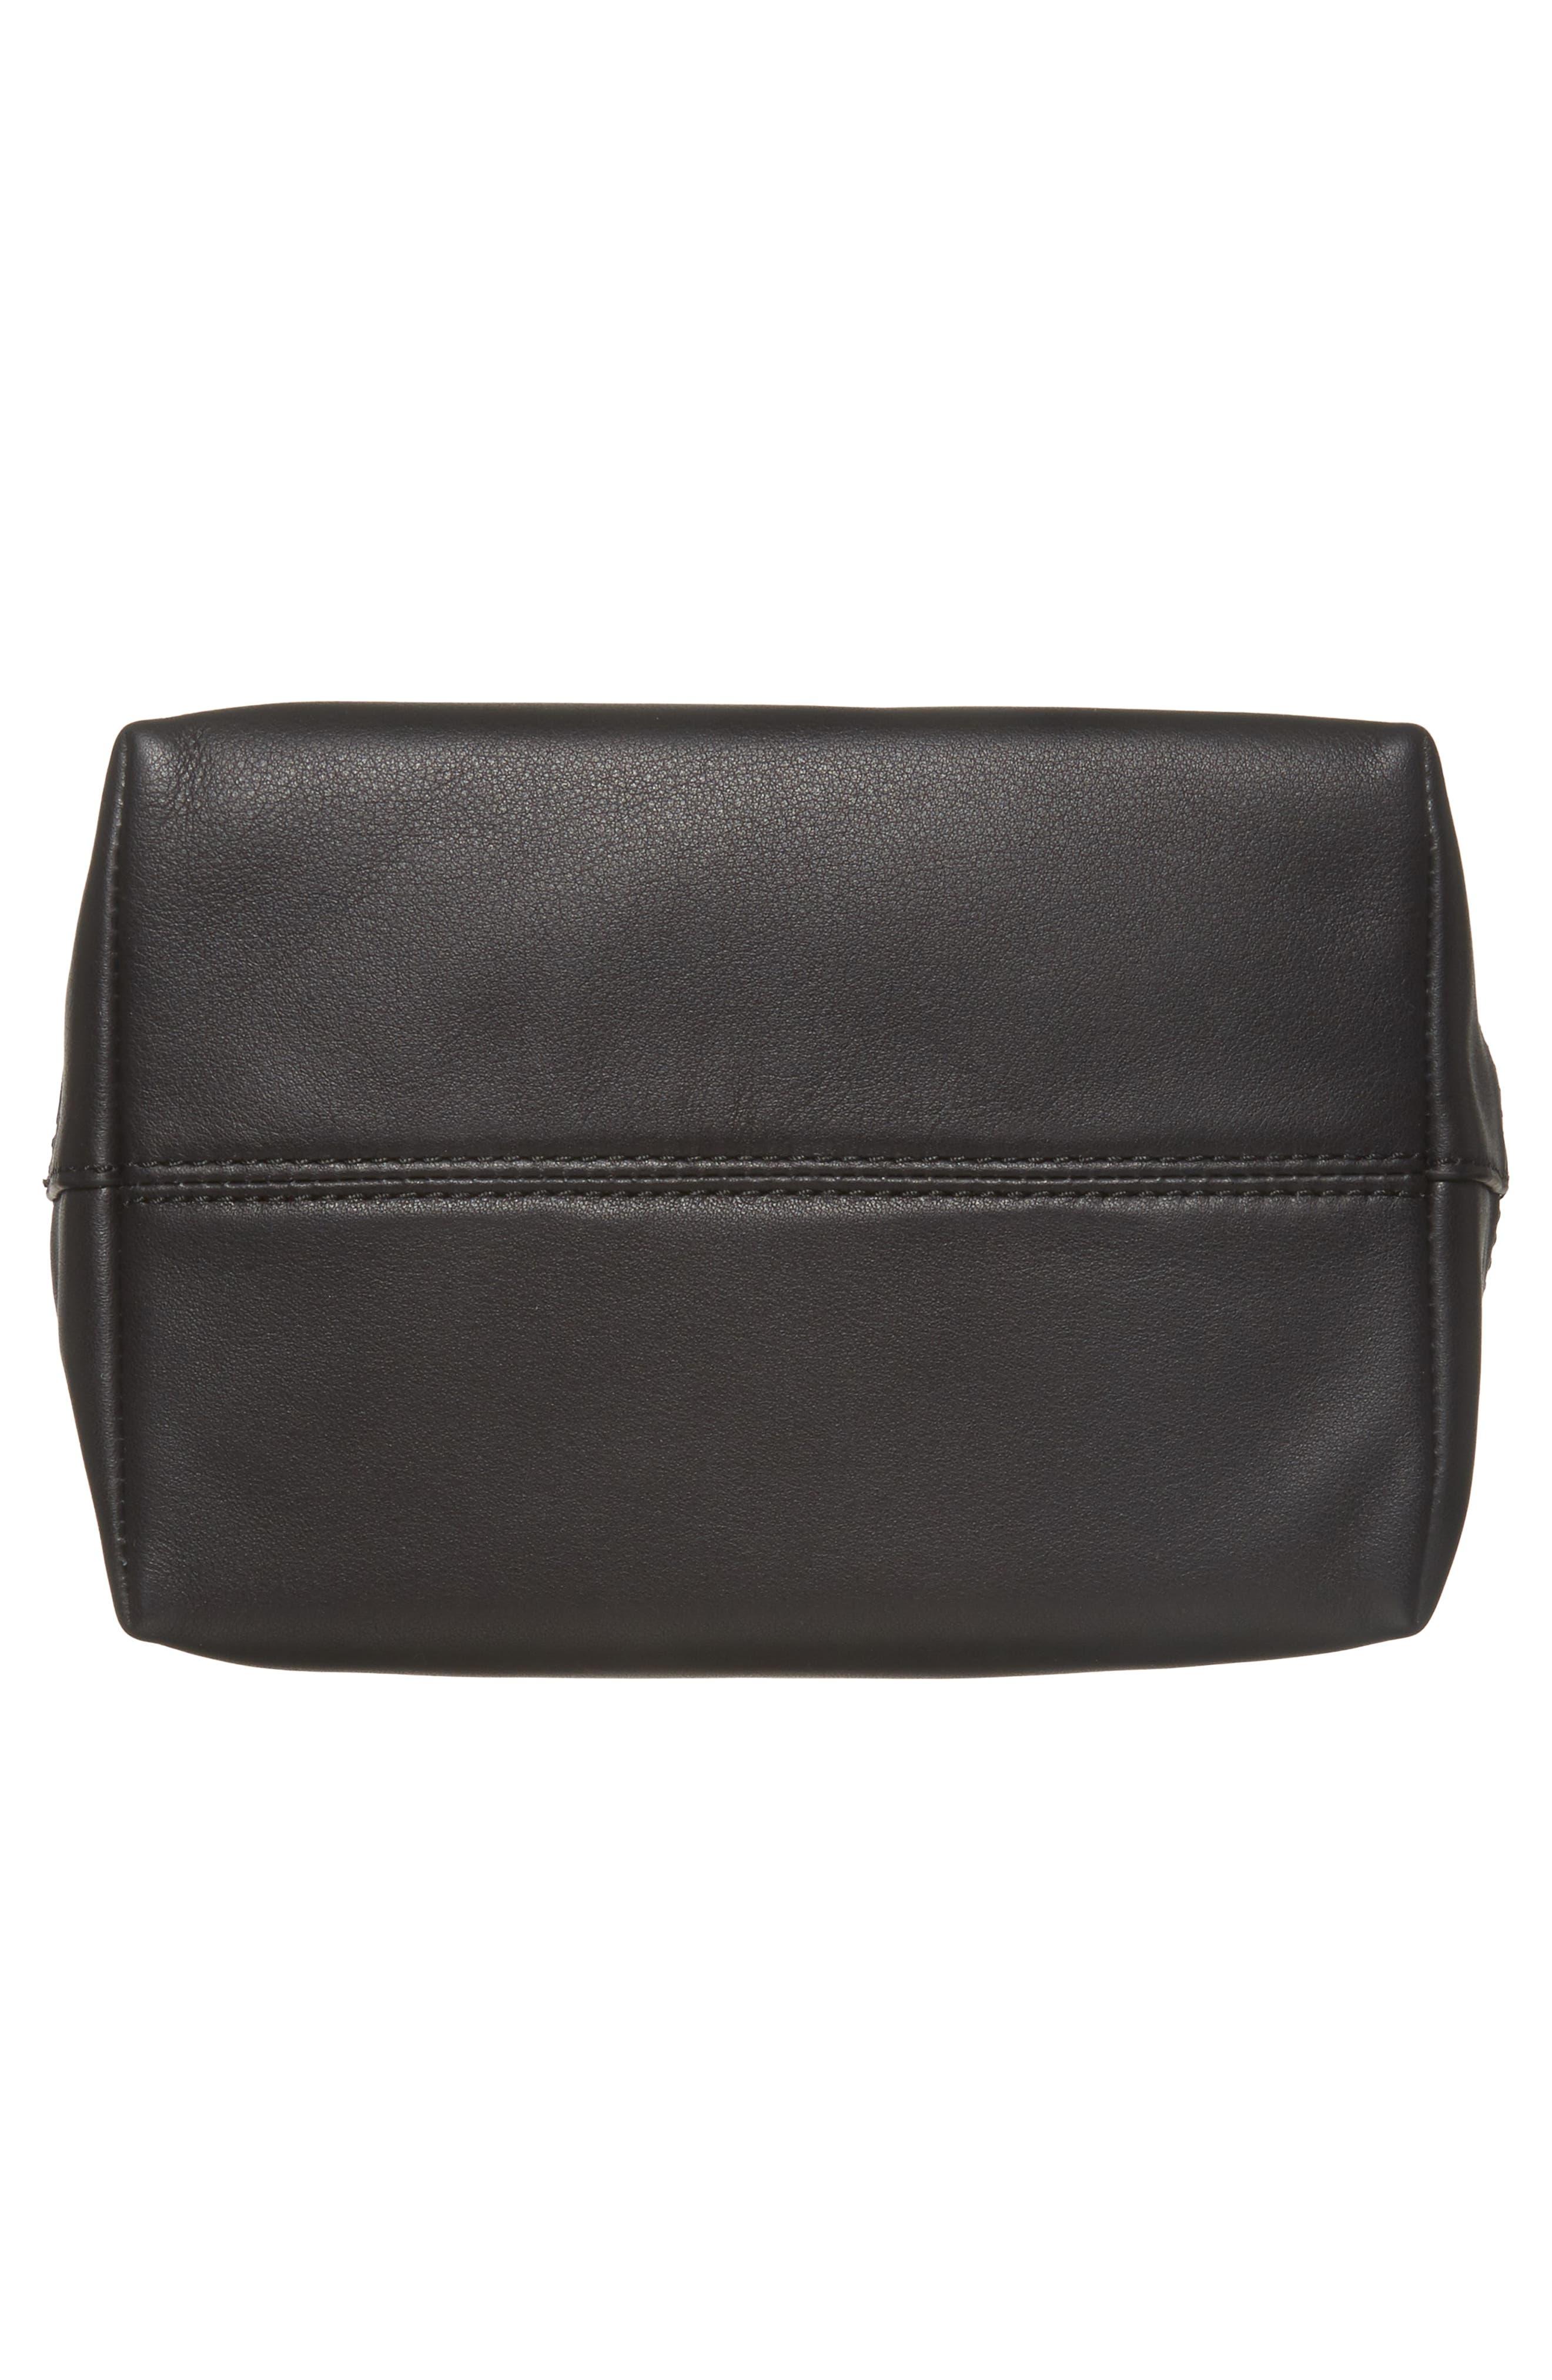 Crossbody Bucket Bag,                             Alternate thumbnail 6, color,                             106